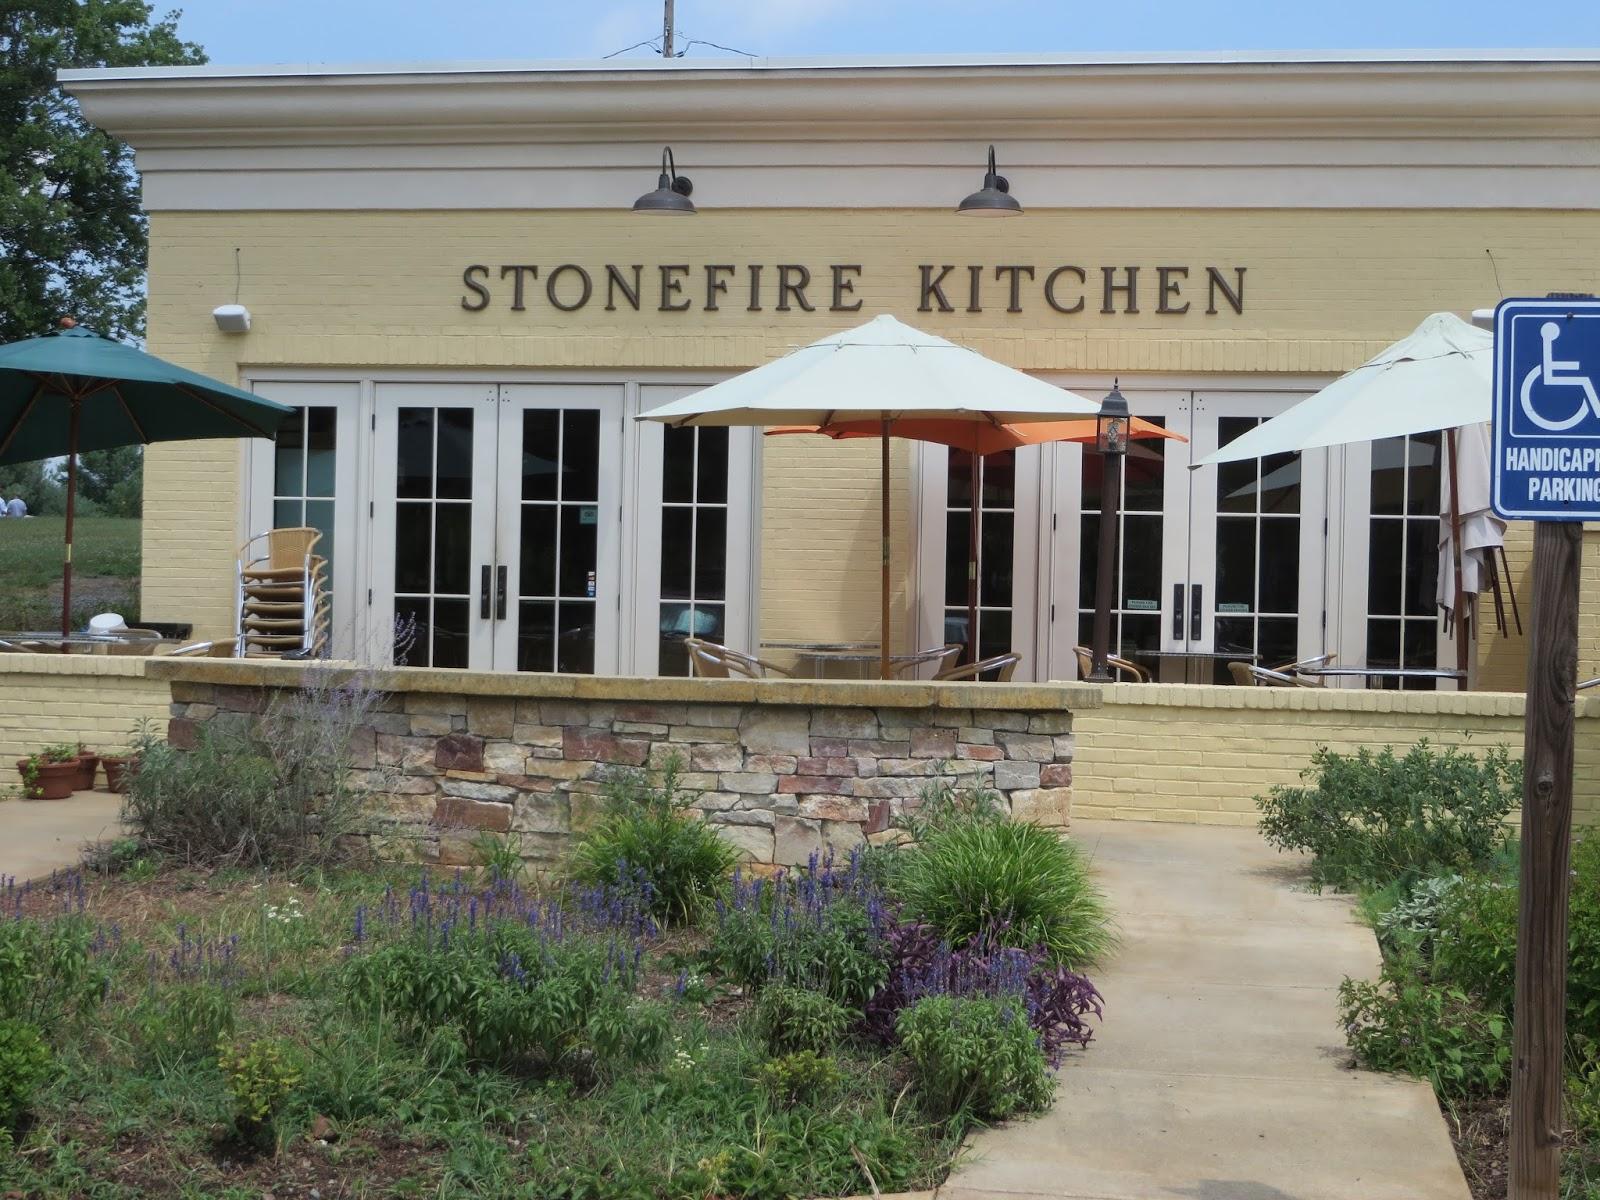 Stonefire Kitchen Restaurant